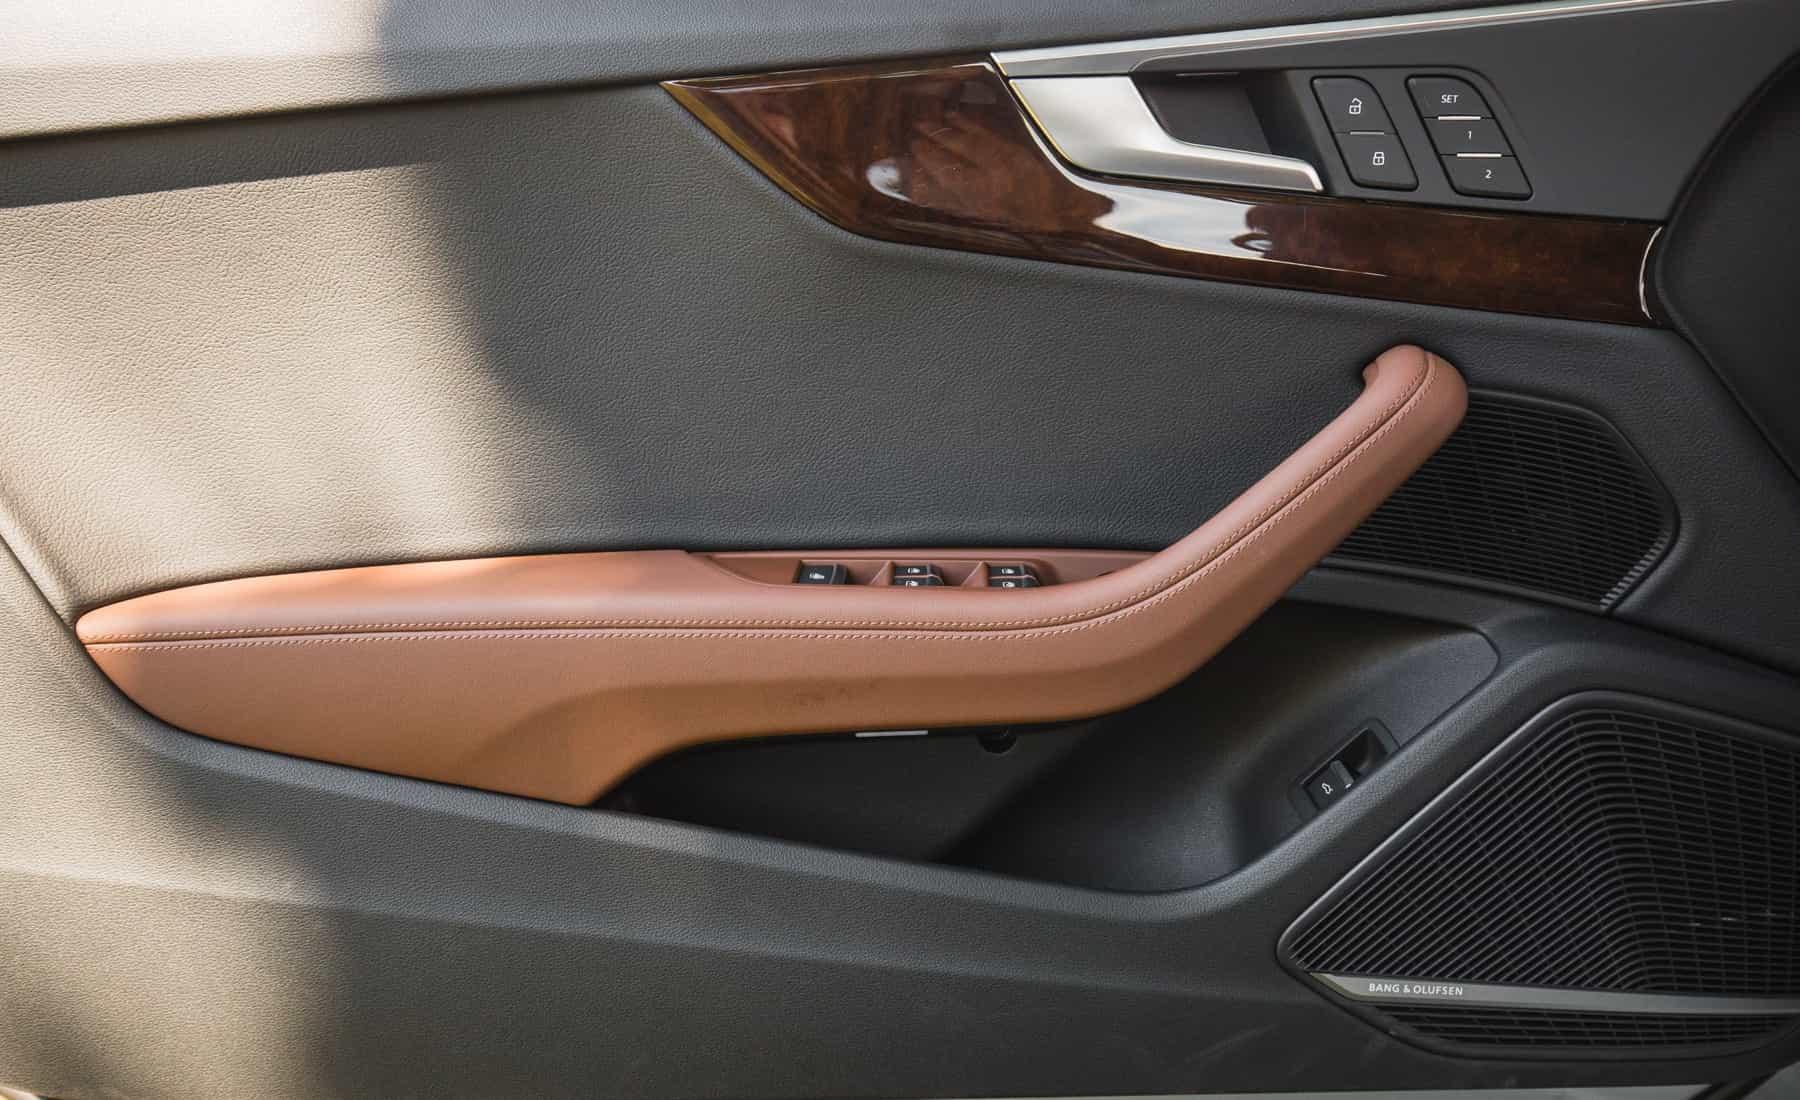 2018 Audi A5 Cabriolet Interior Door Trim Front (Photo 24 of 45)